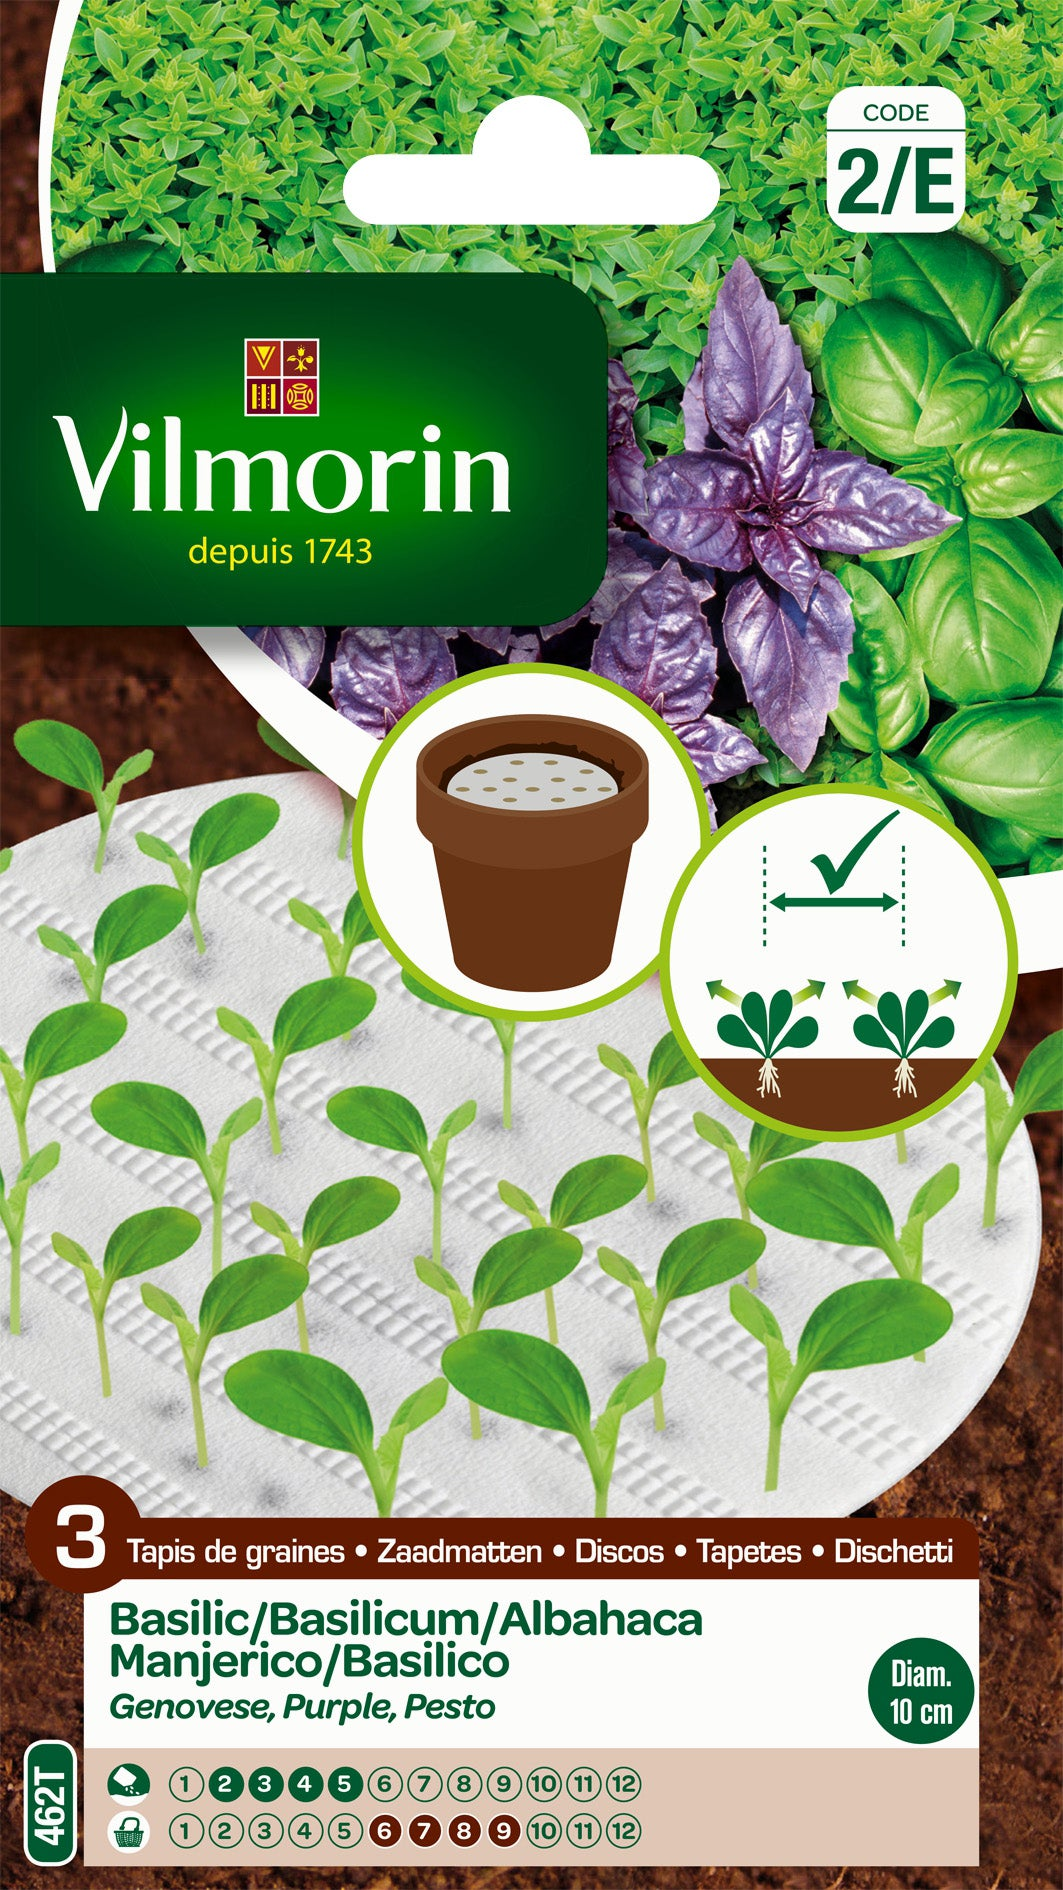 tapis de graines grand vert pesto pourpre vilmorin 5 g